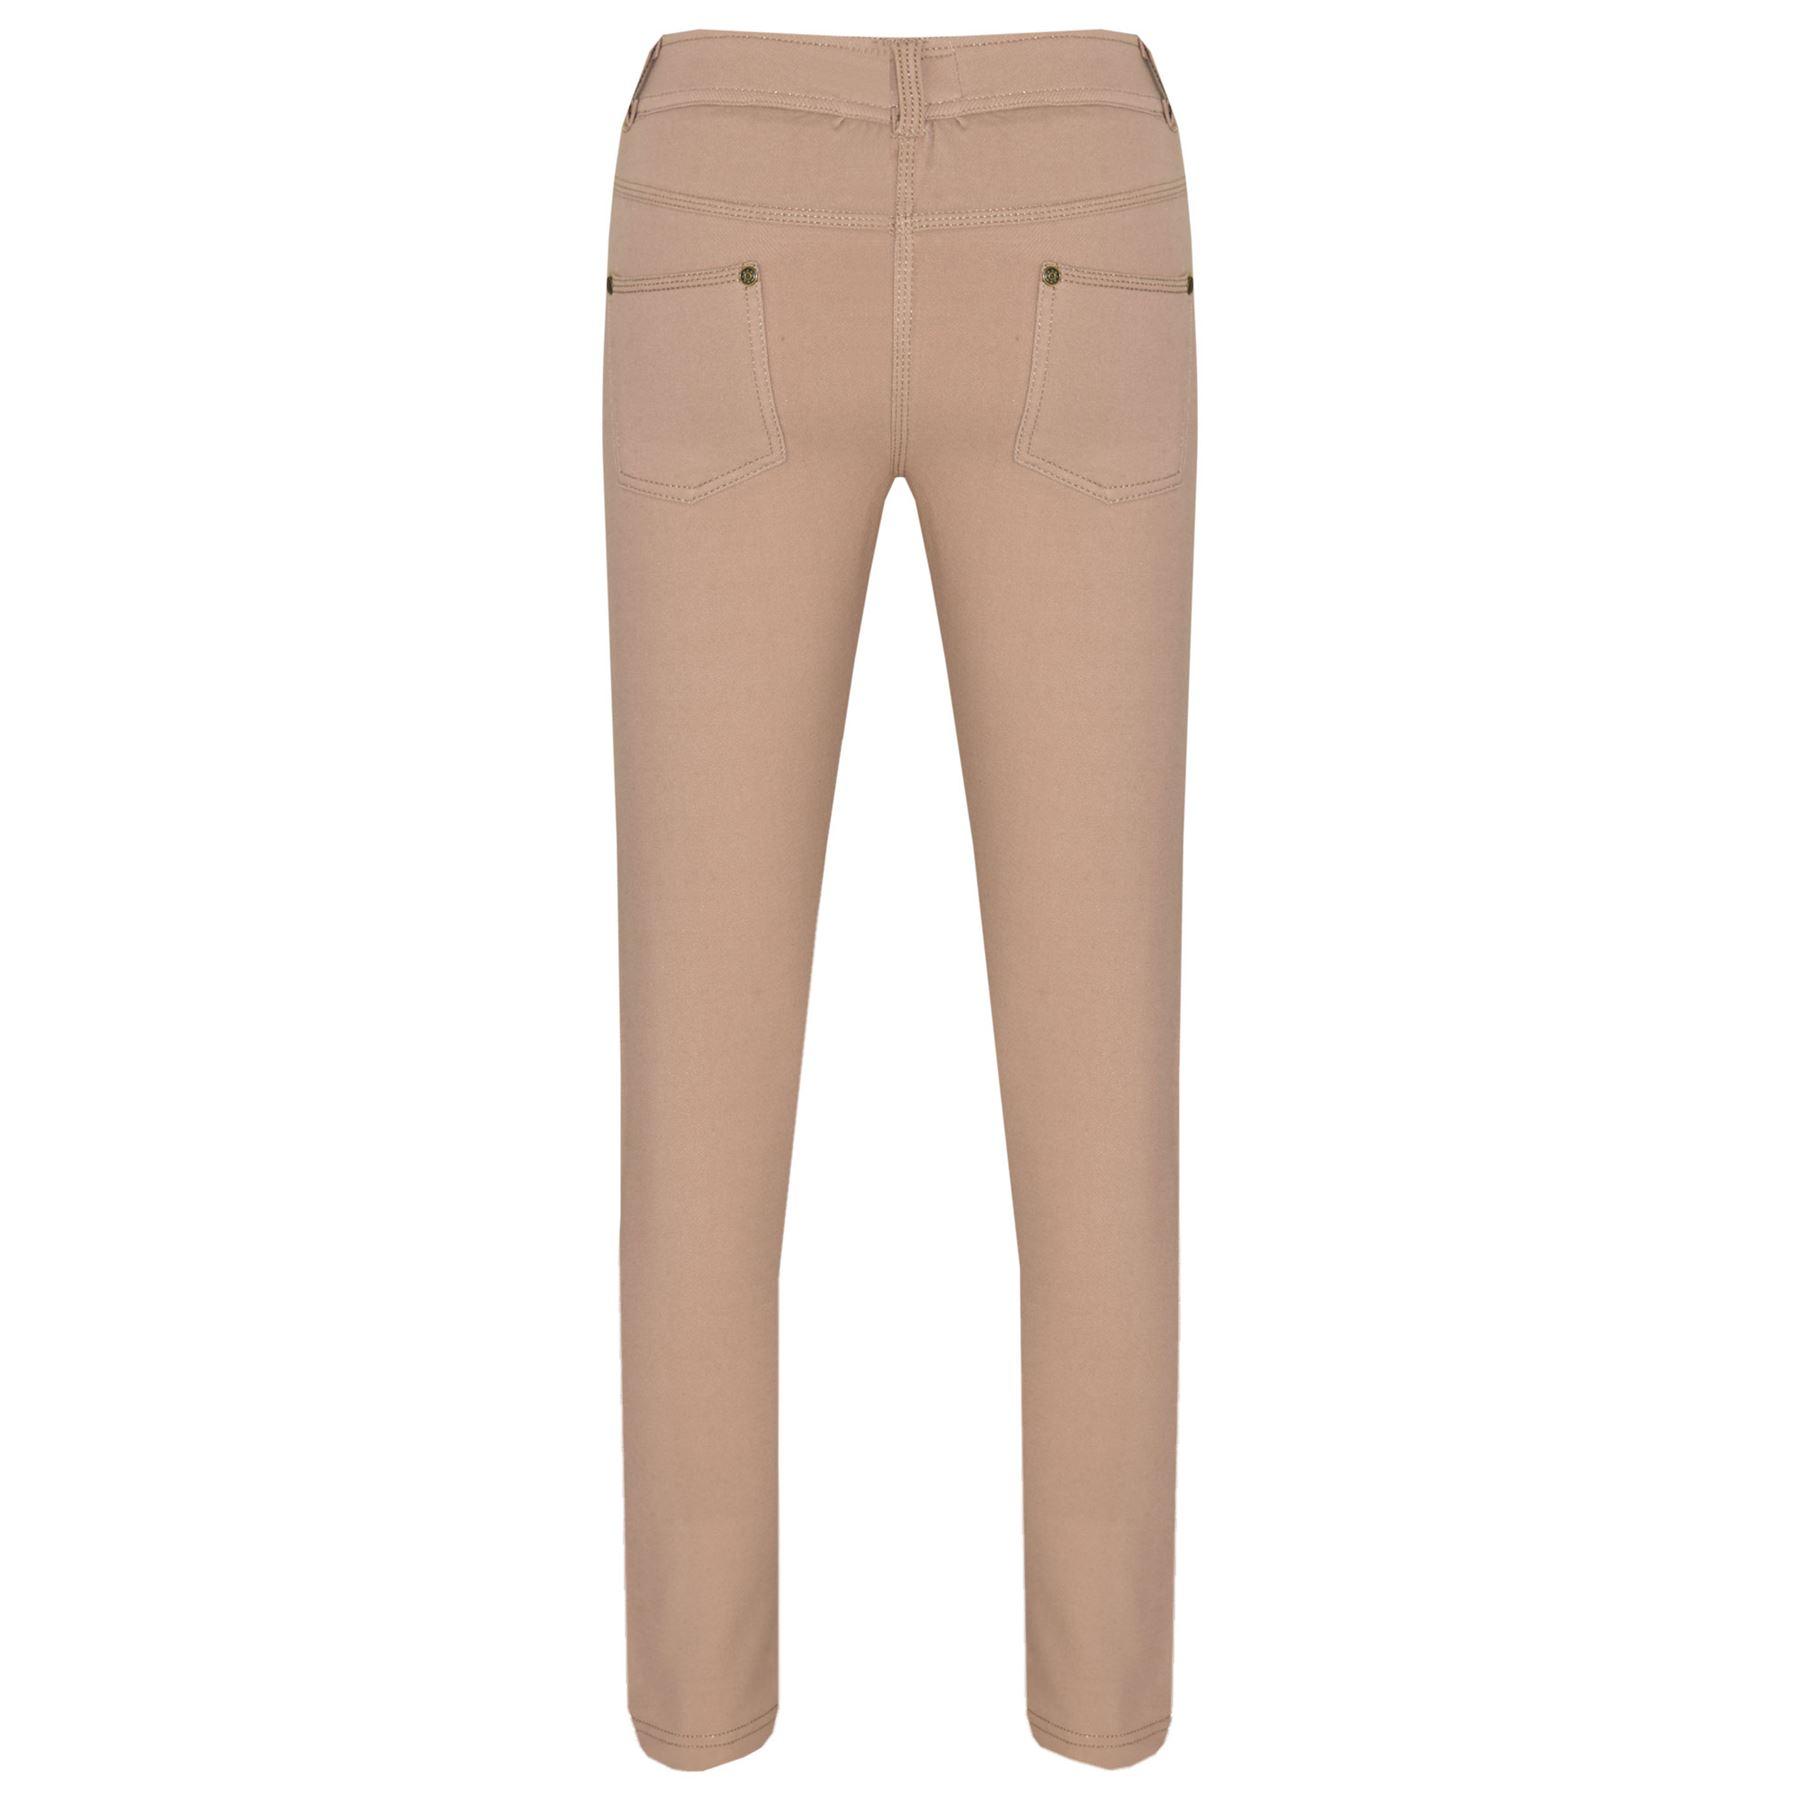 3c98f054b226c Girls Skinny Jeans Kids Stone Stretchy Denim Jeggings Fit Pants ...